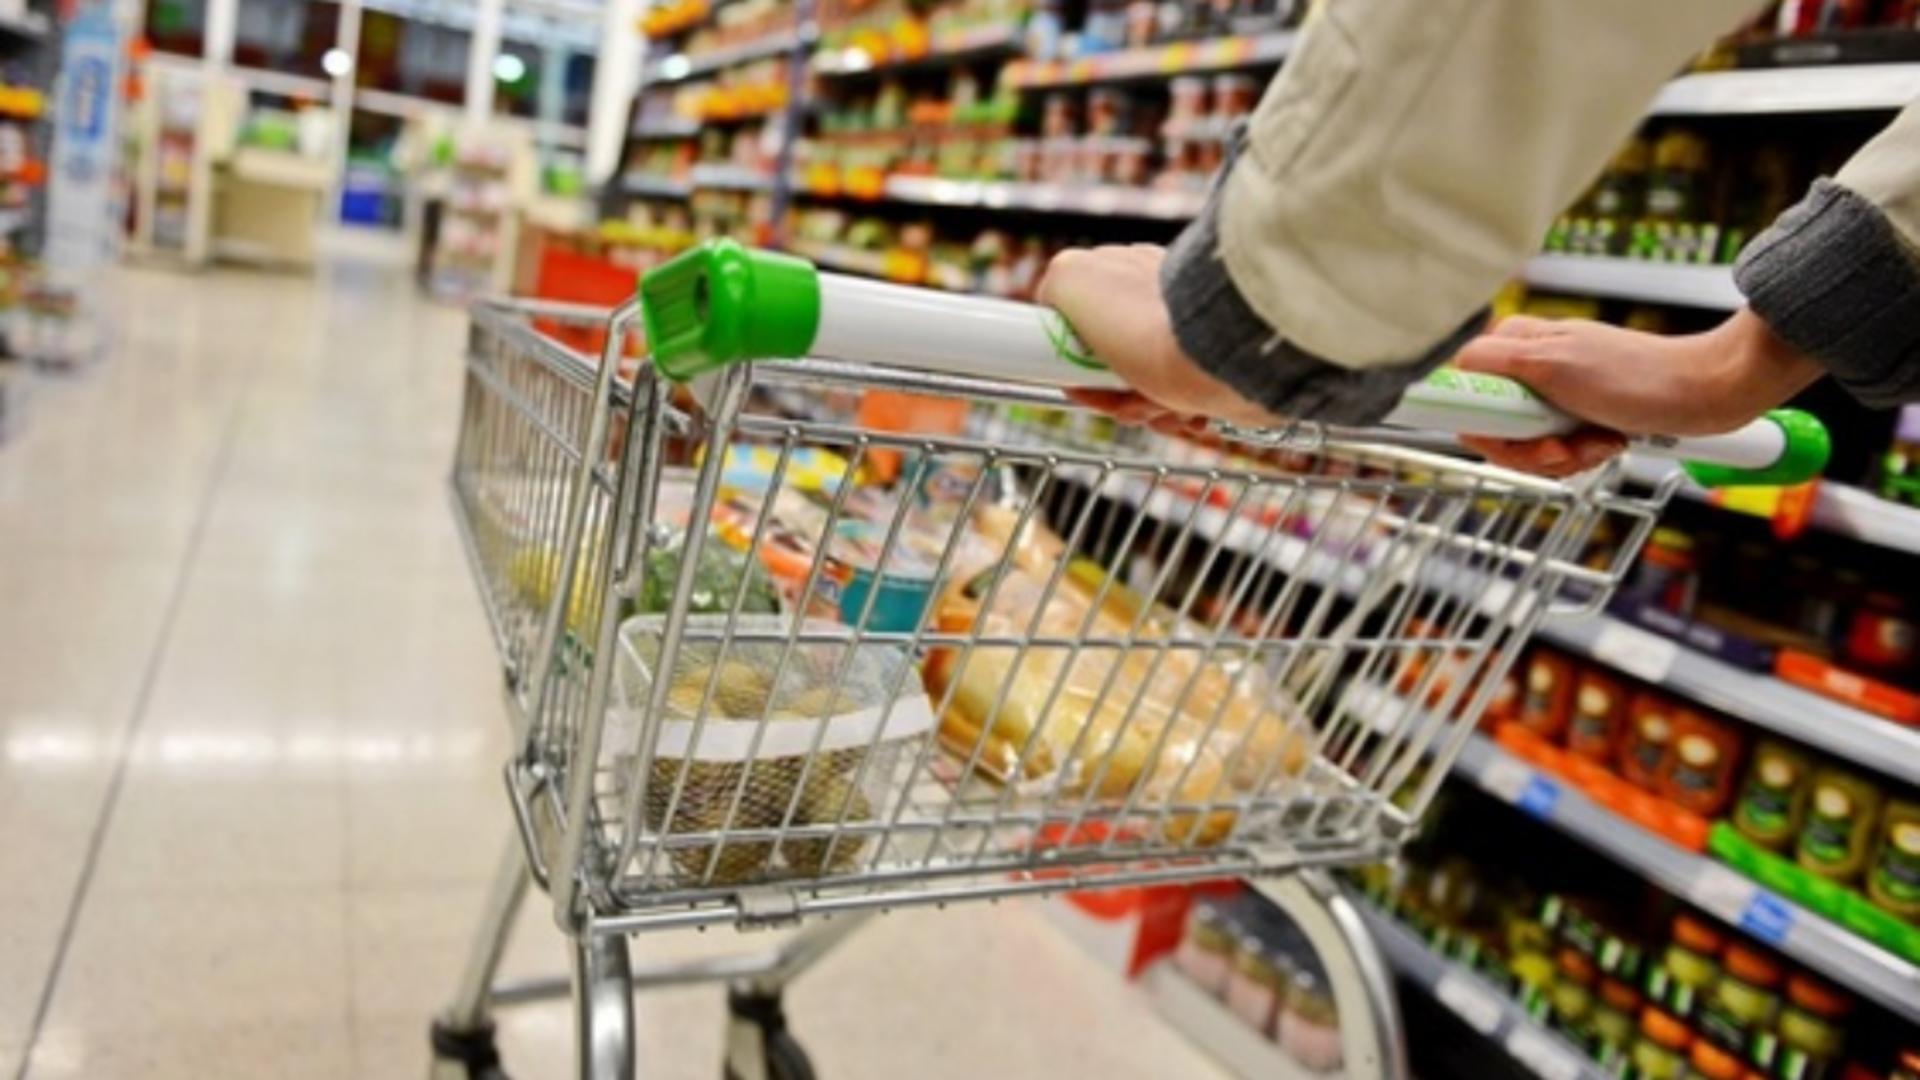 Produs retras de la raft, într-un supermarket din România